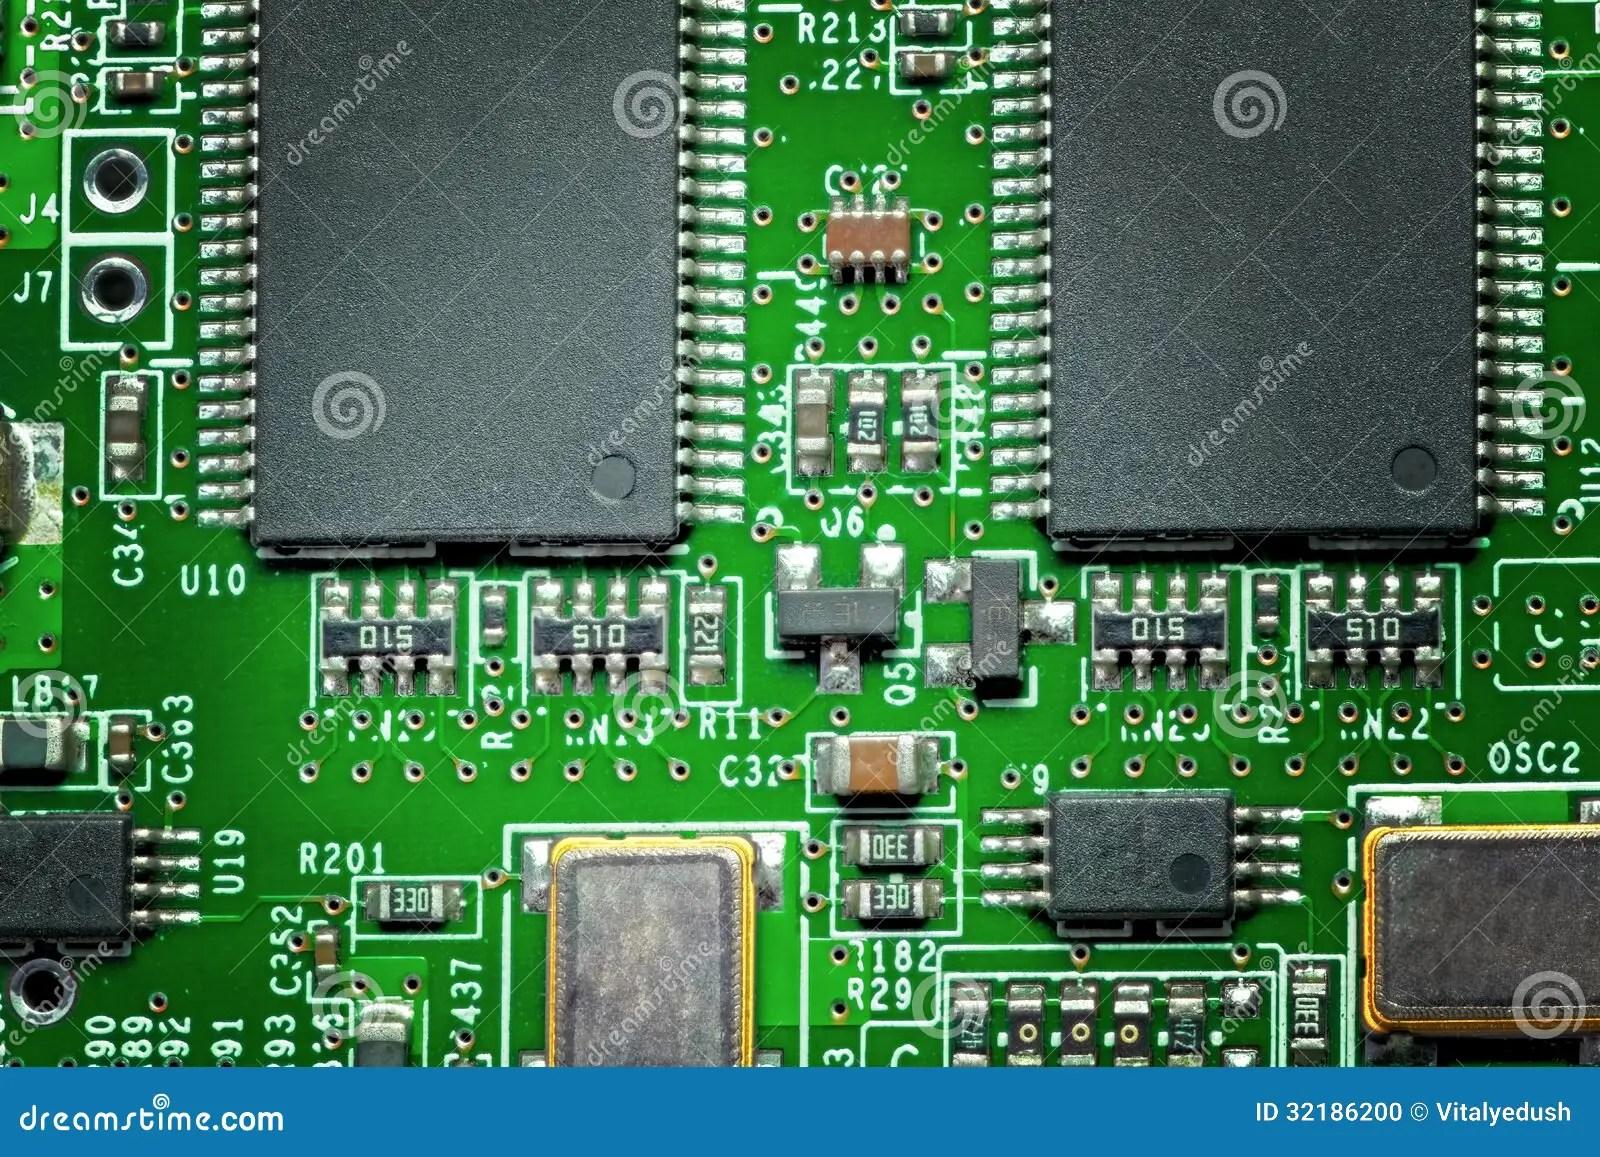 Circuit Board Stock Photo Image 33992840